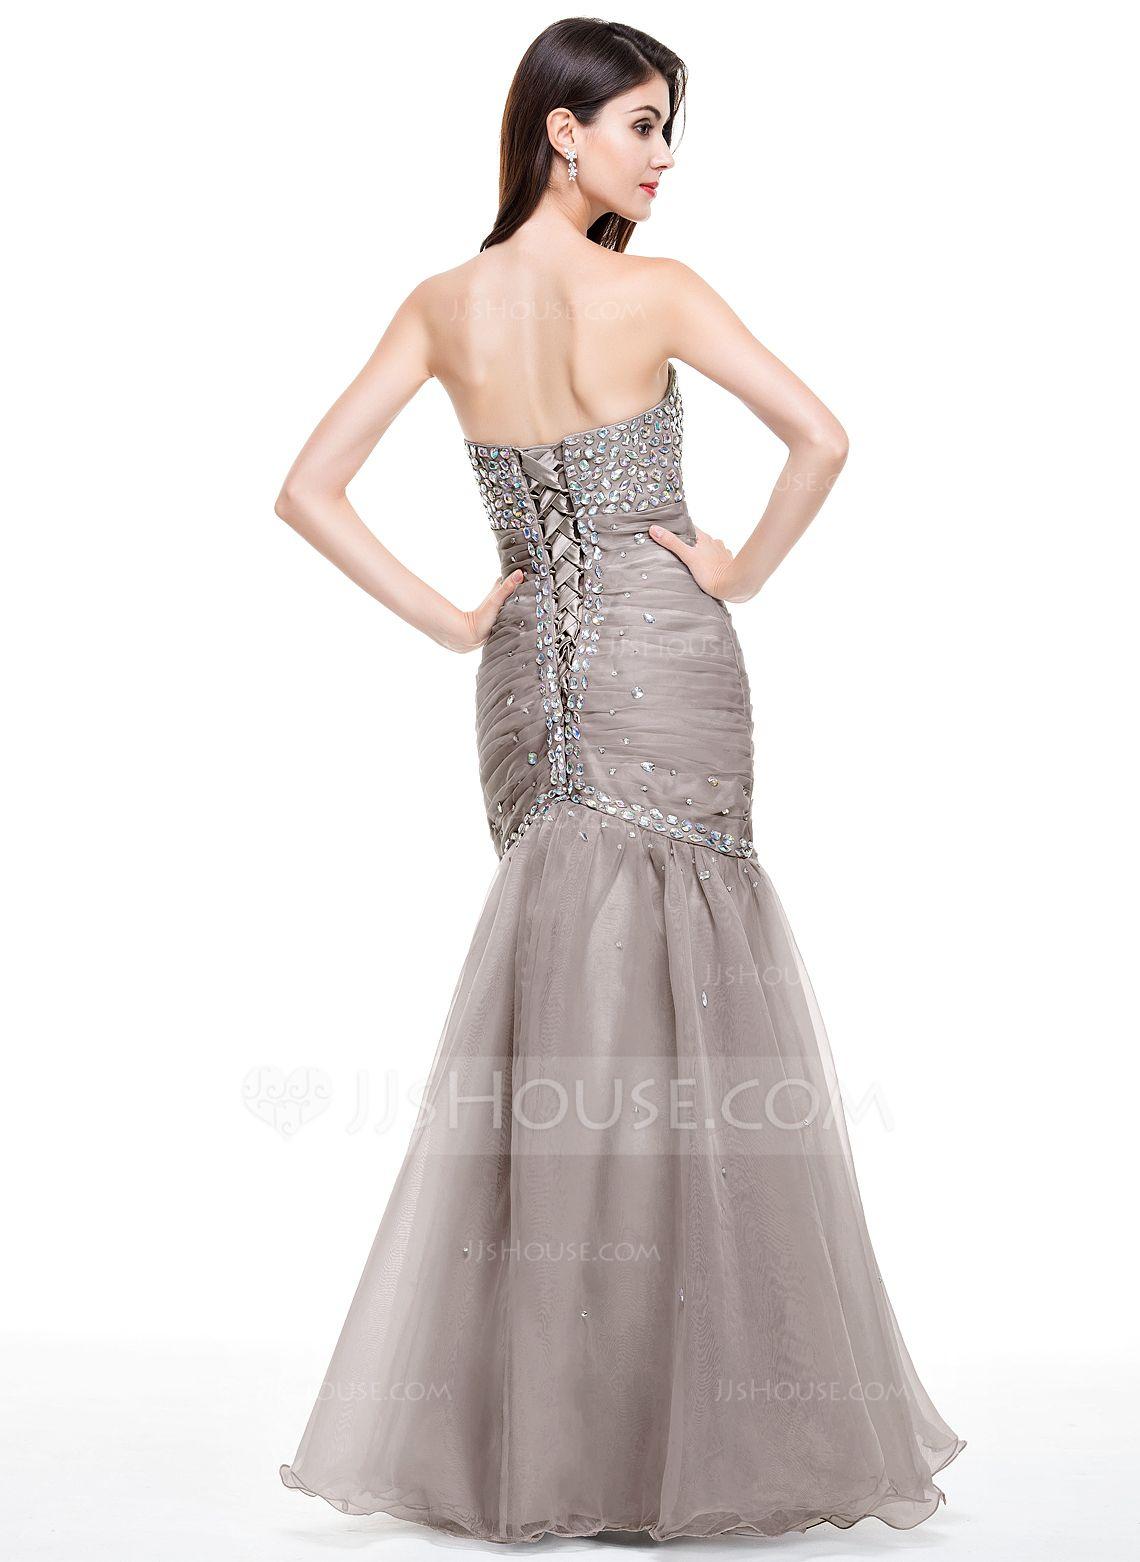 Trumpetmermaid sweetheart floorlength organza prom dress with